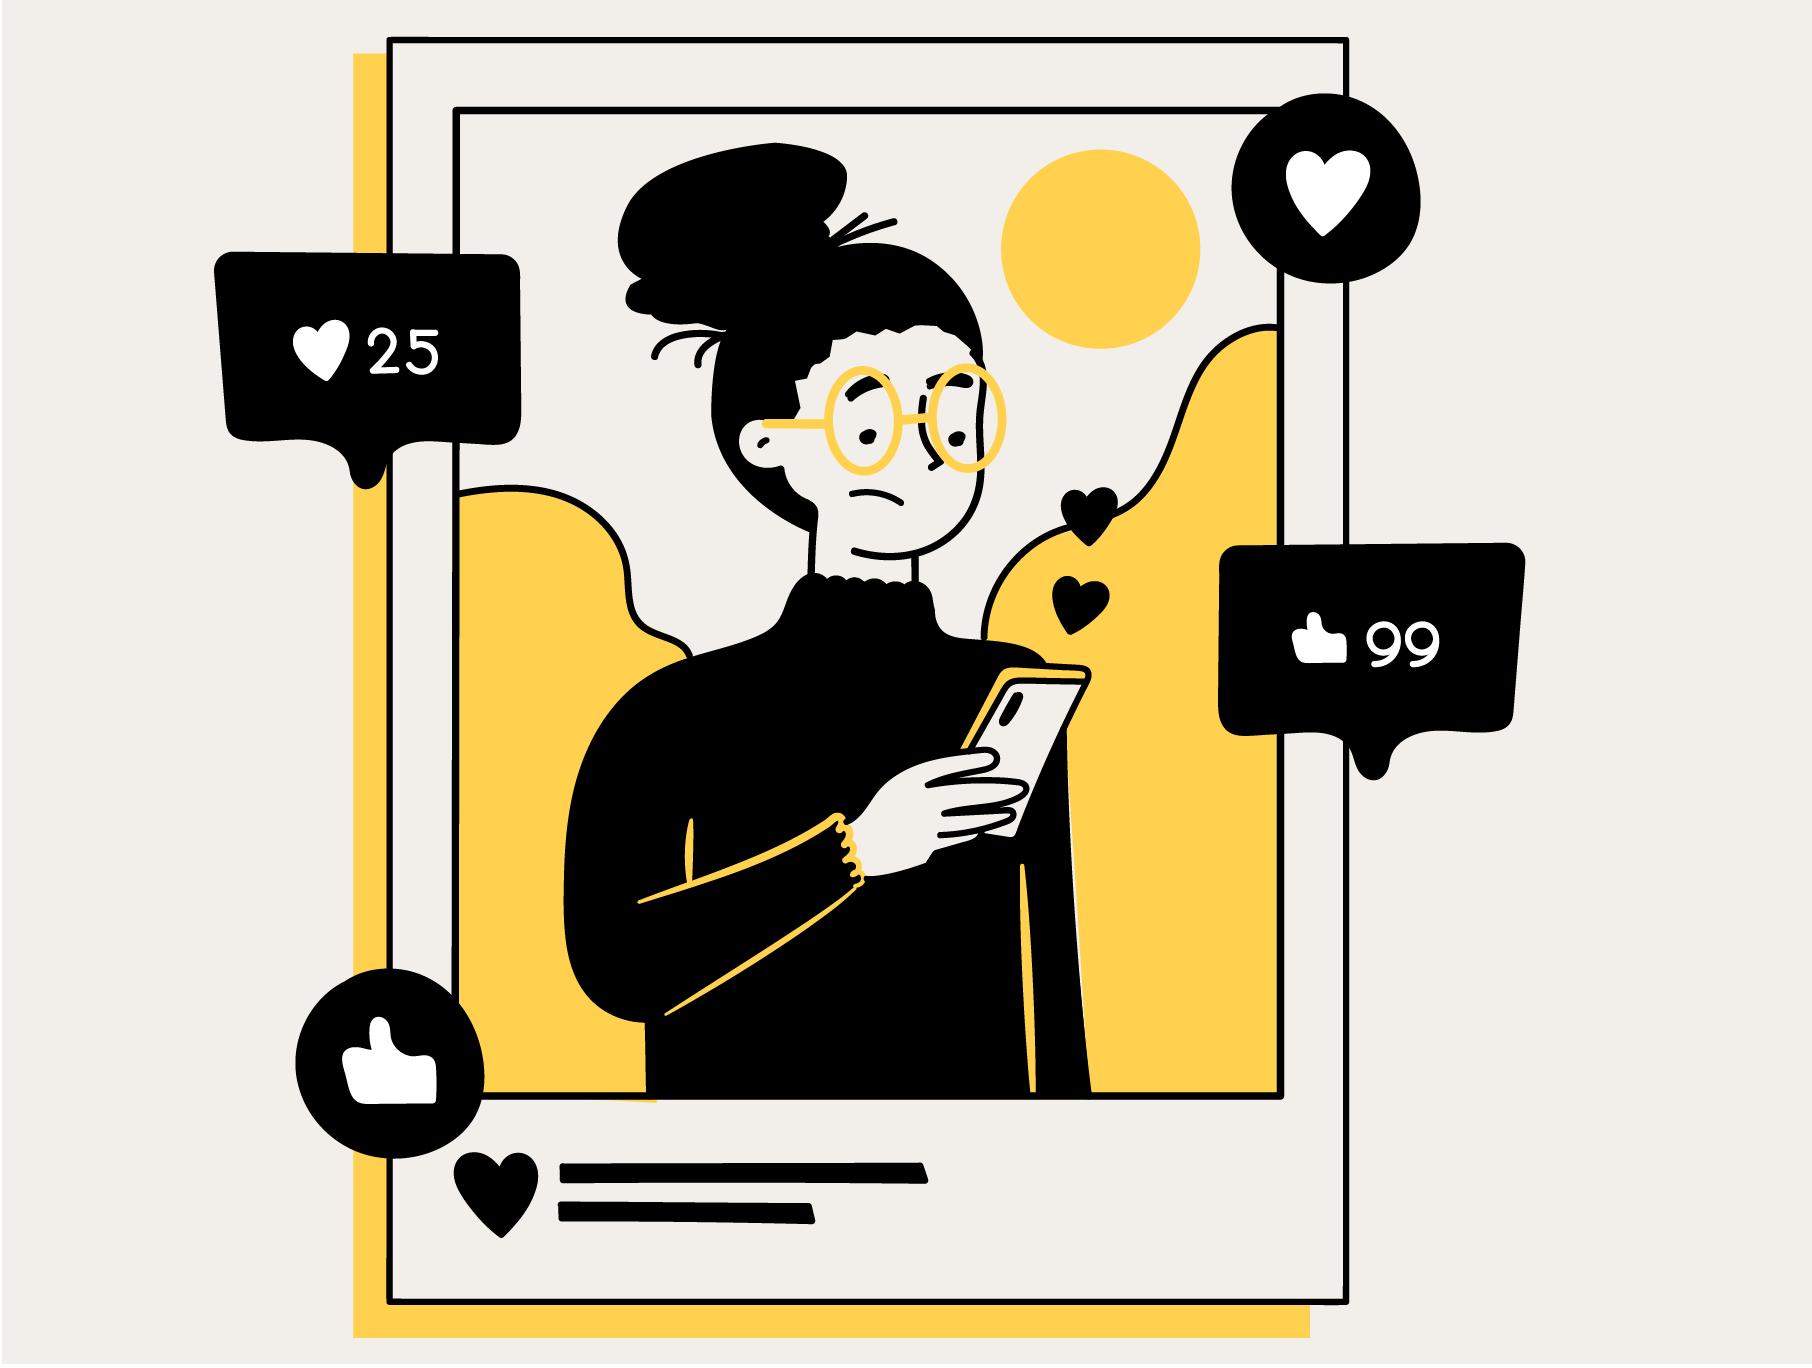 Toxic Positivity: Why 'Love Yourself' Isn't Helpful Advice